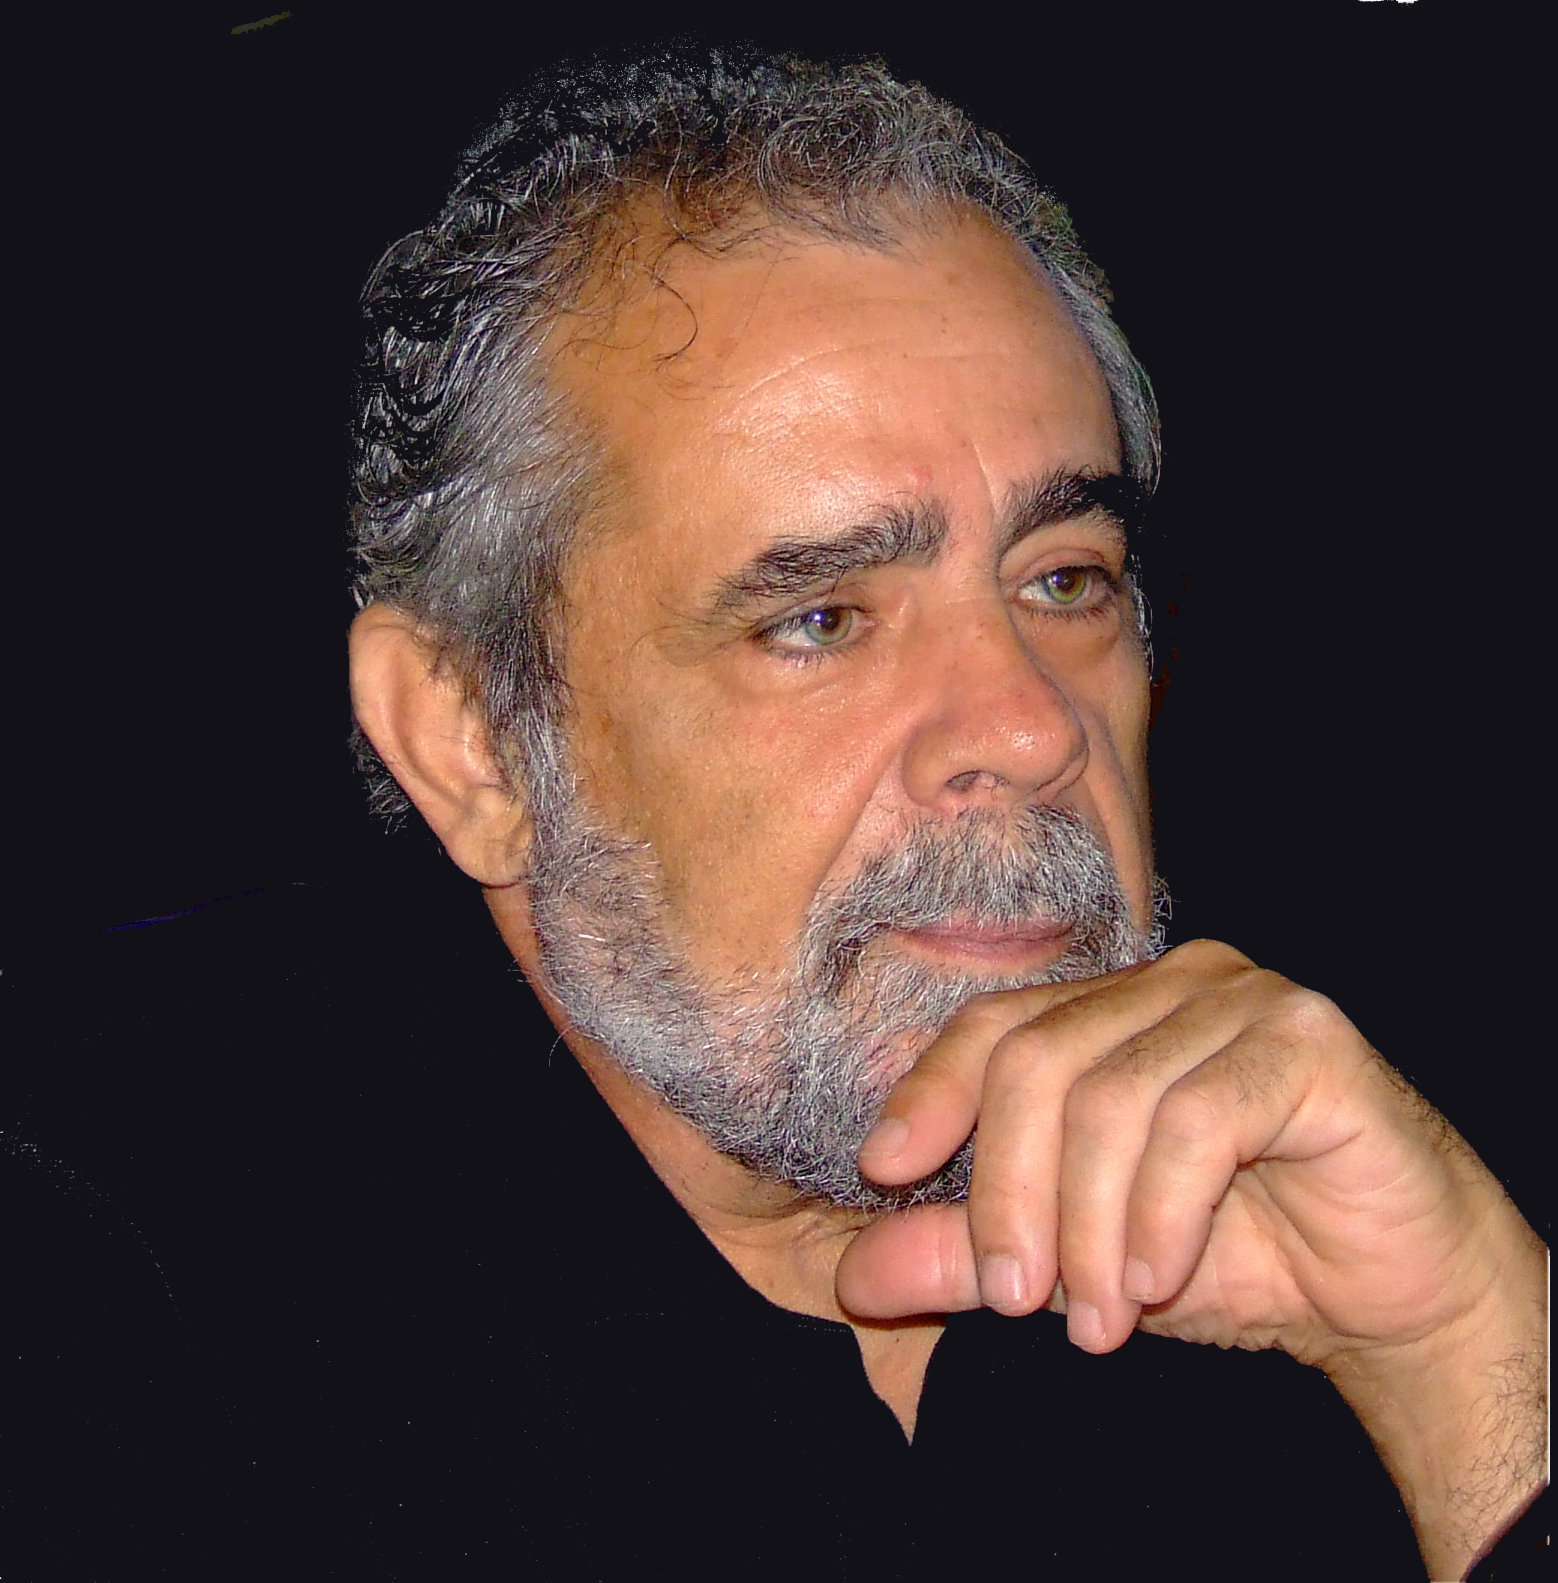 Francesco Angioni